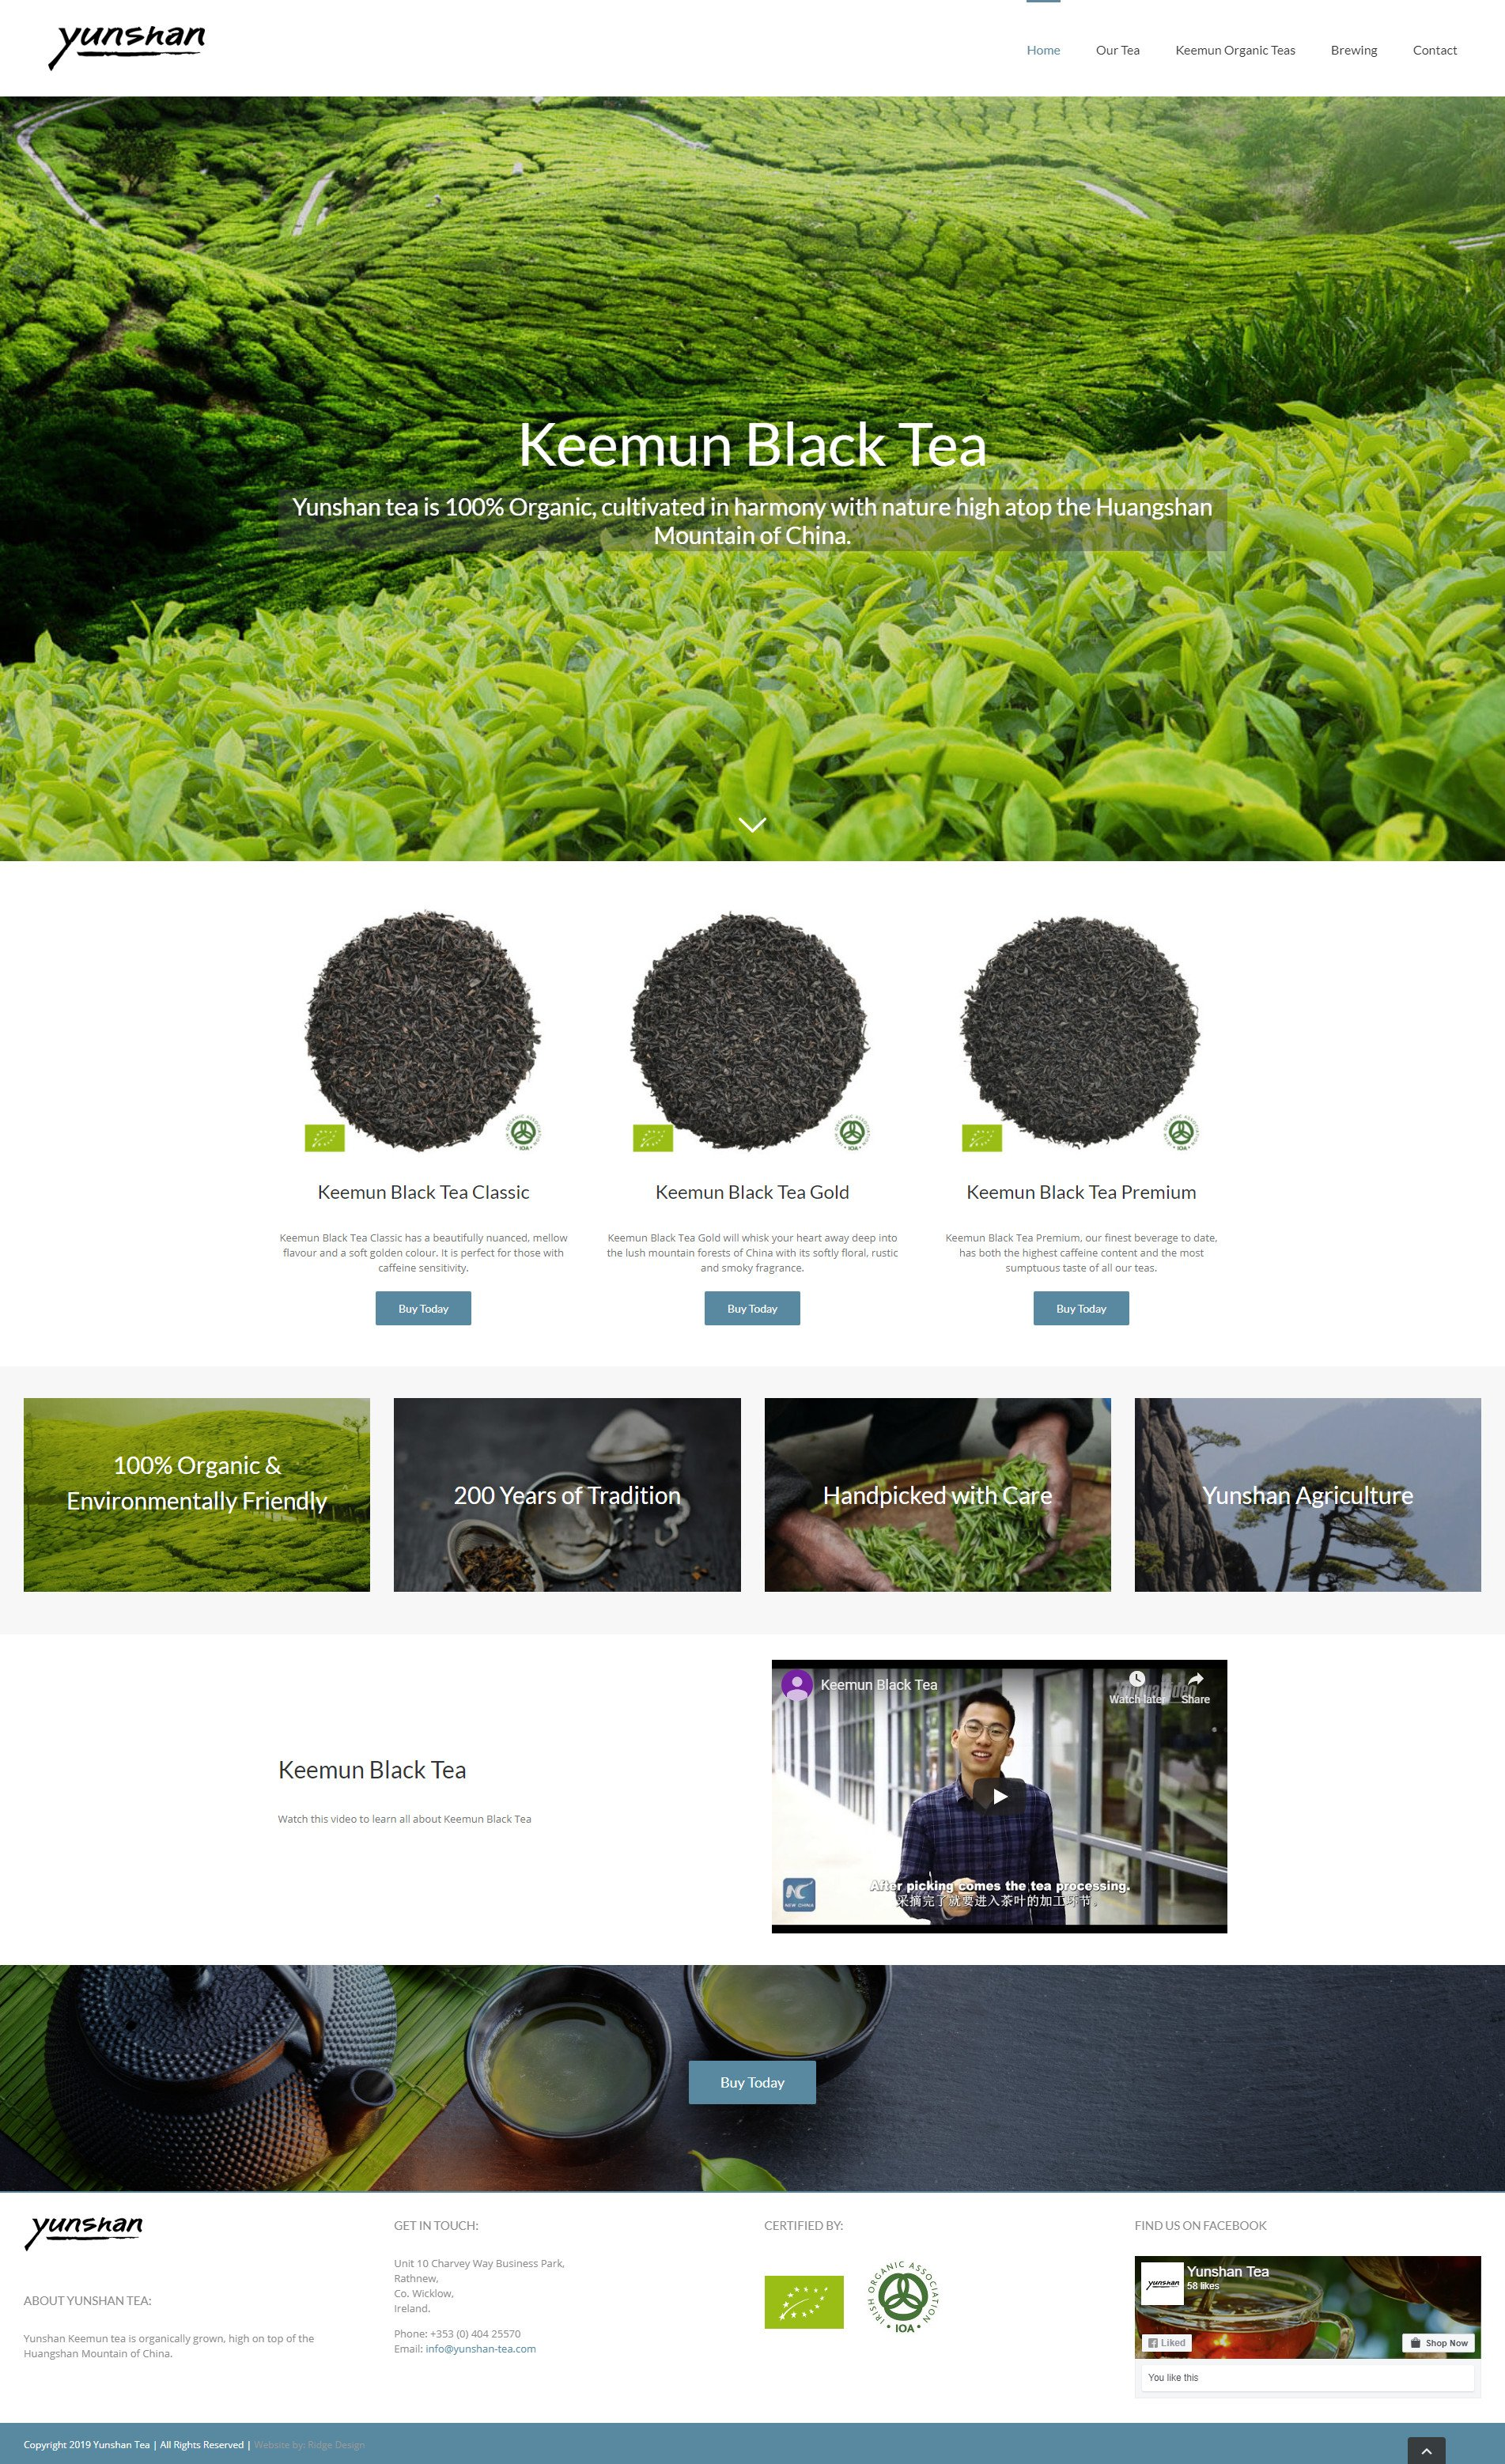 Yunshan-Tea-Website-Design-Home-Page